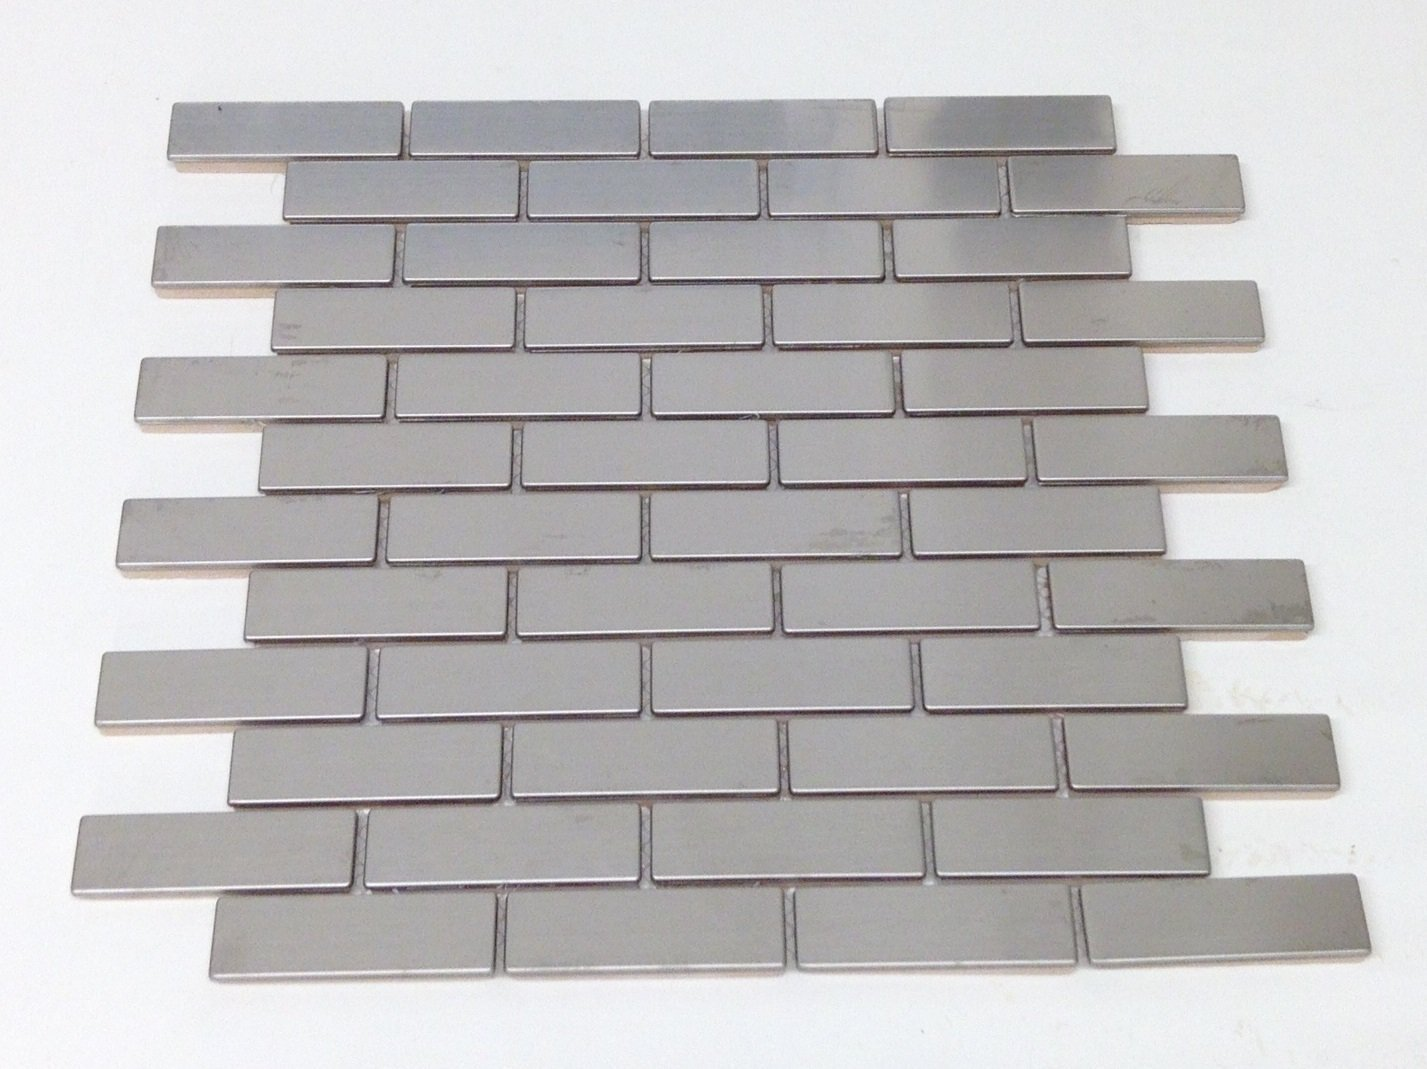 Silver Stainless Steel 1 x 3 inch Backsplash Mosaic Tile